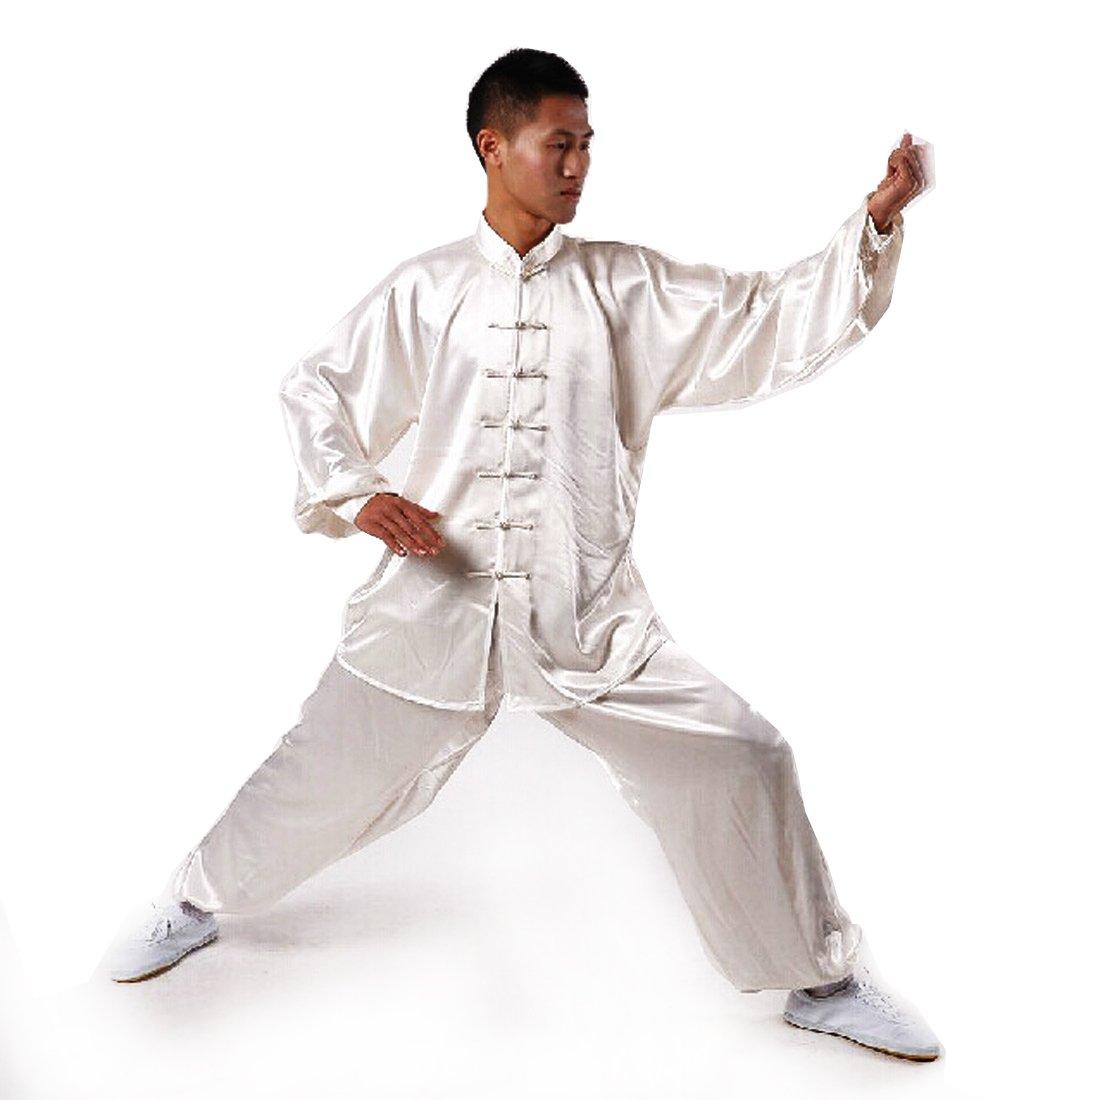 Andux marziali tai chi Kung Fu uniformi Unisex SS tjf01Bianco